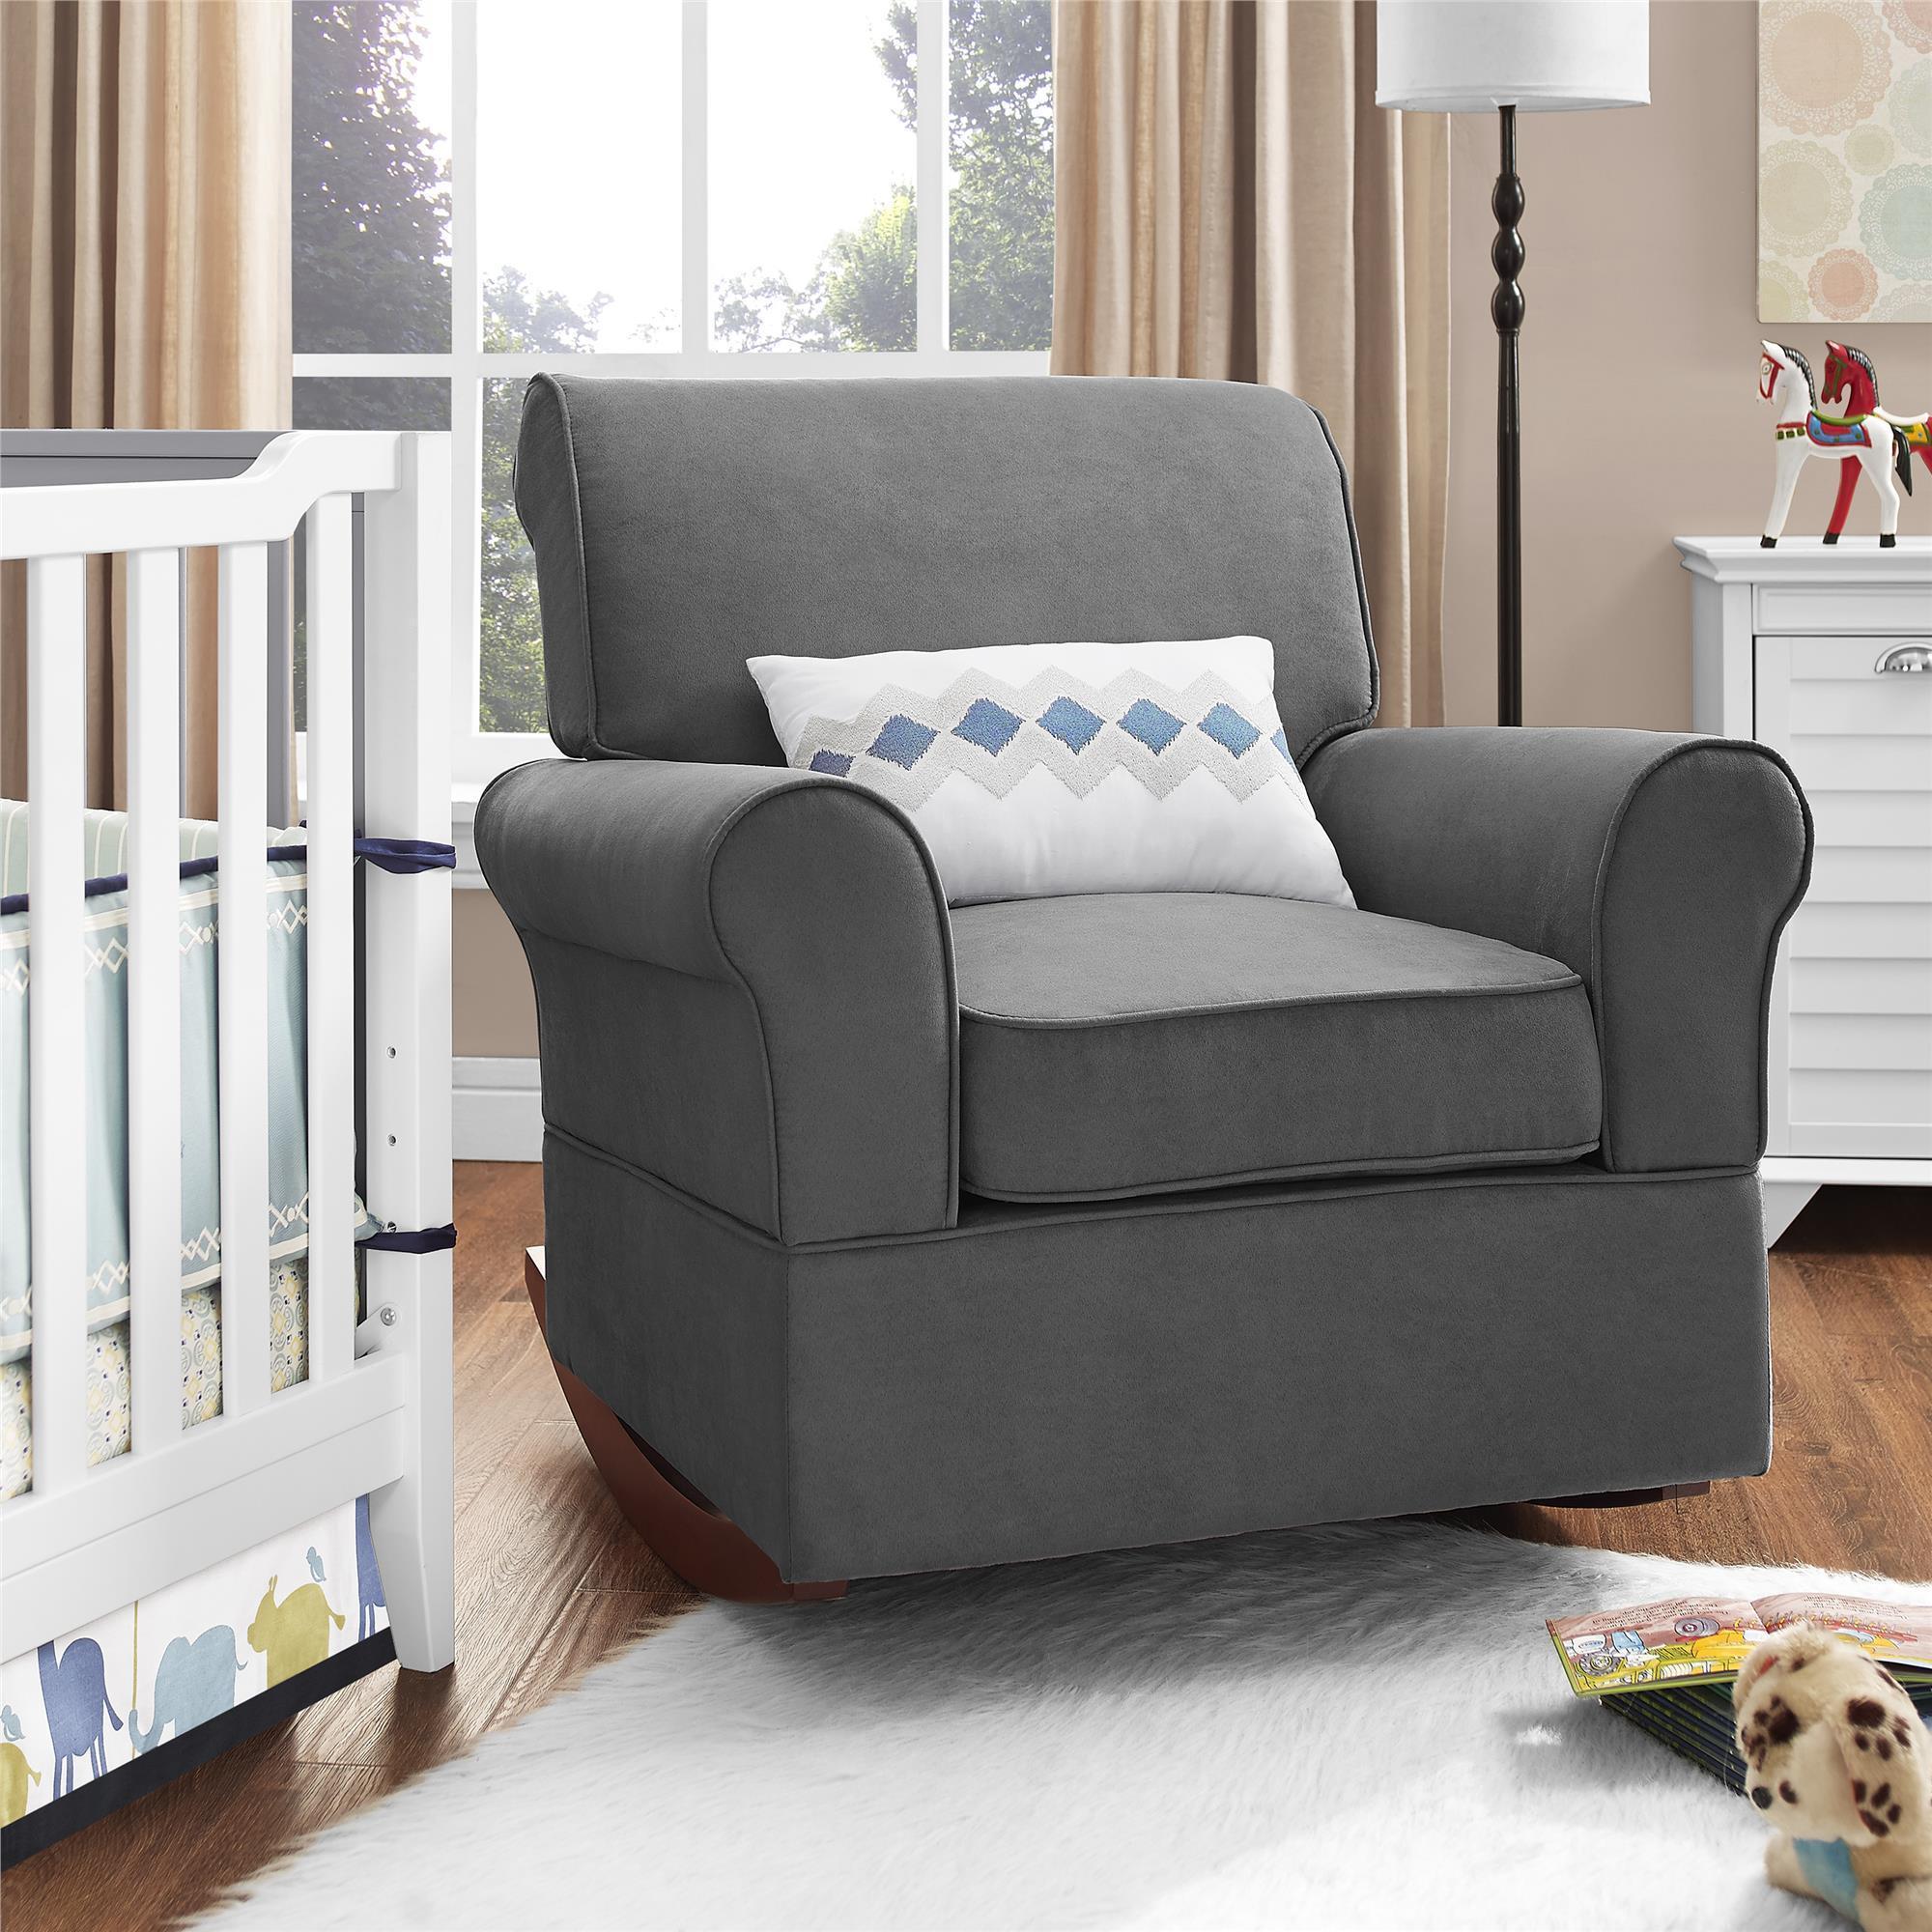 Baby Relax Mackenzie Grey Rocker